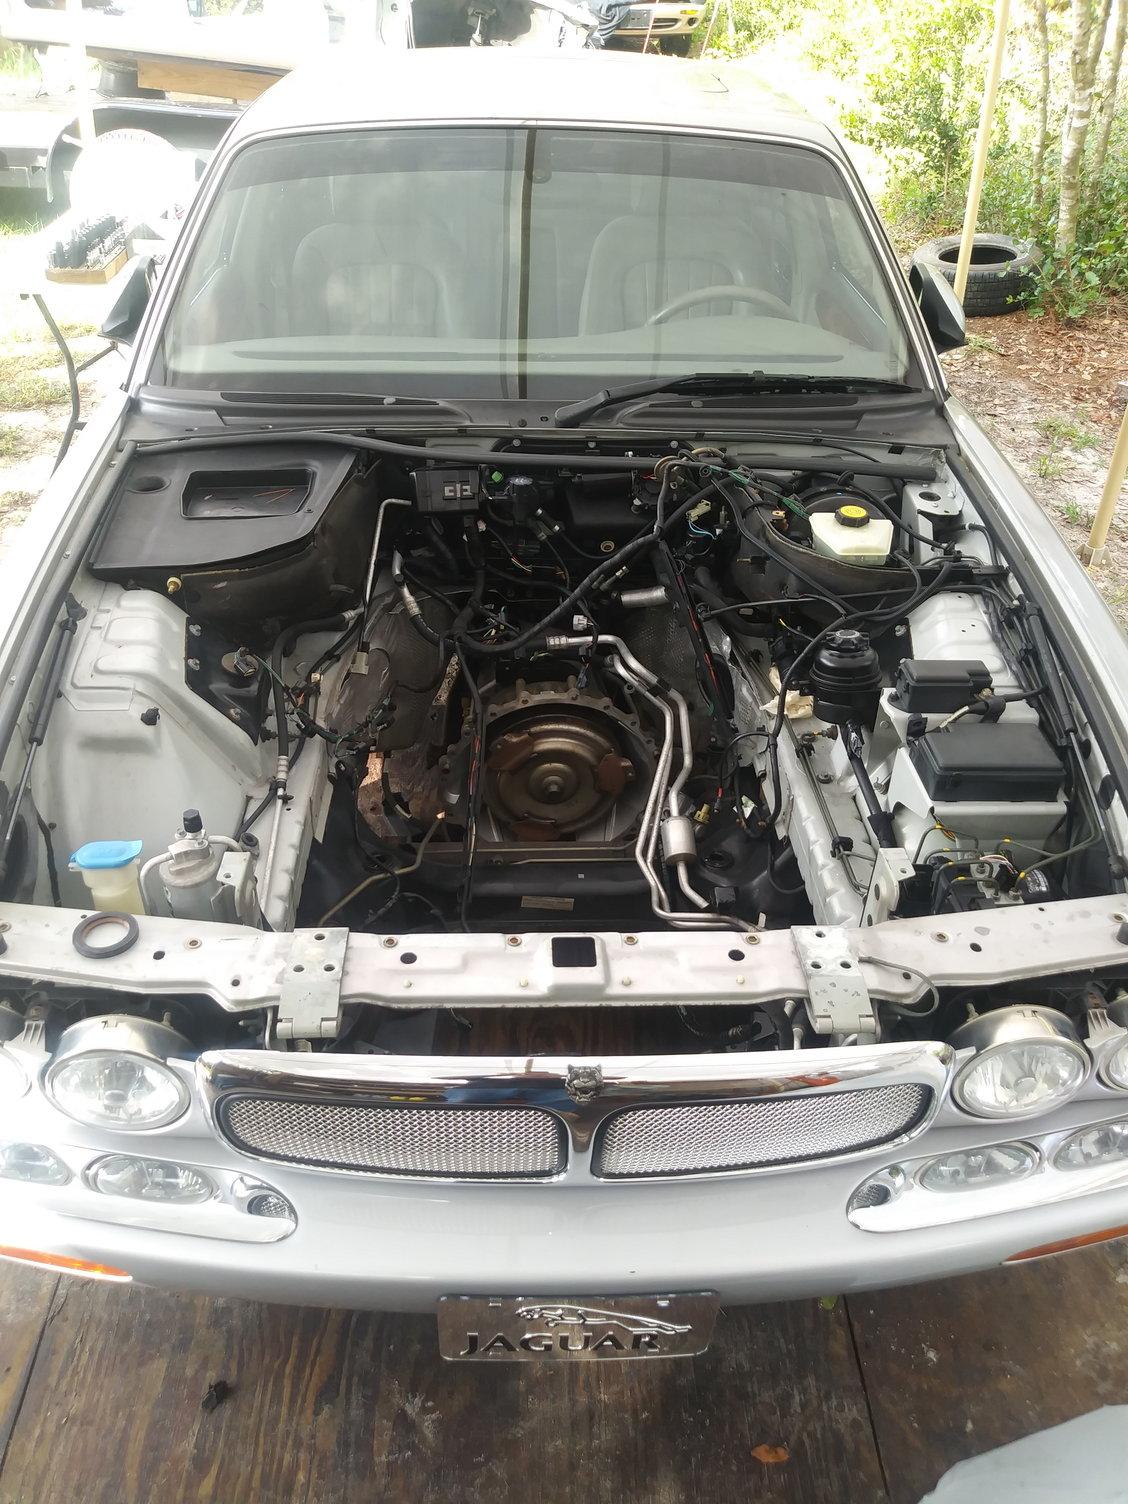 For Jaguar V8 XJ8 XJR Passenger Right Engine Camshaft Position Sensor Eurospare